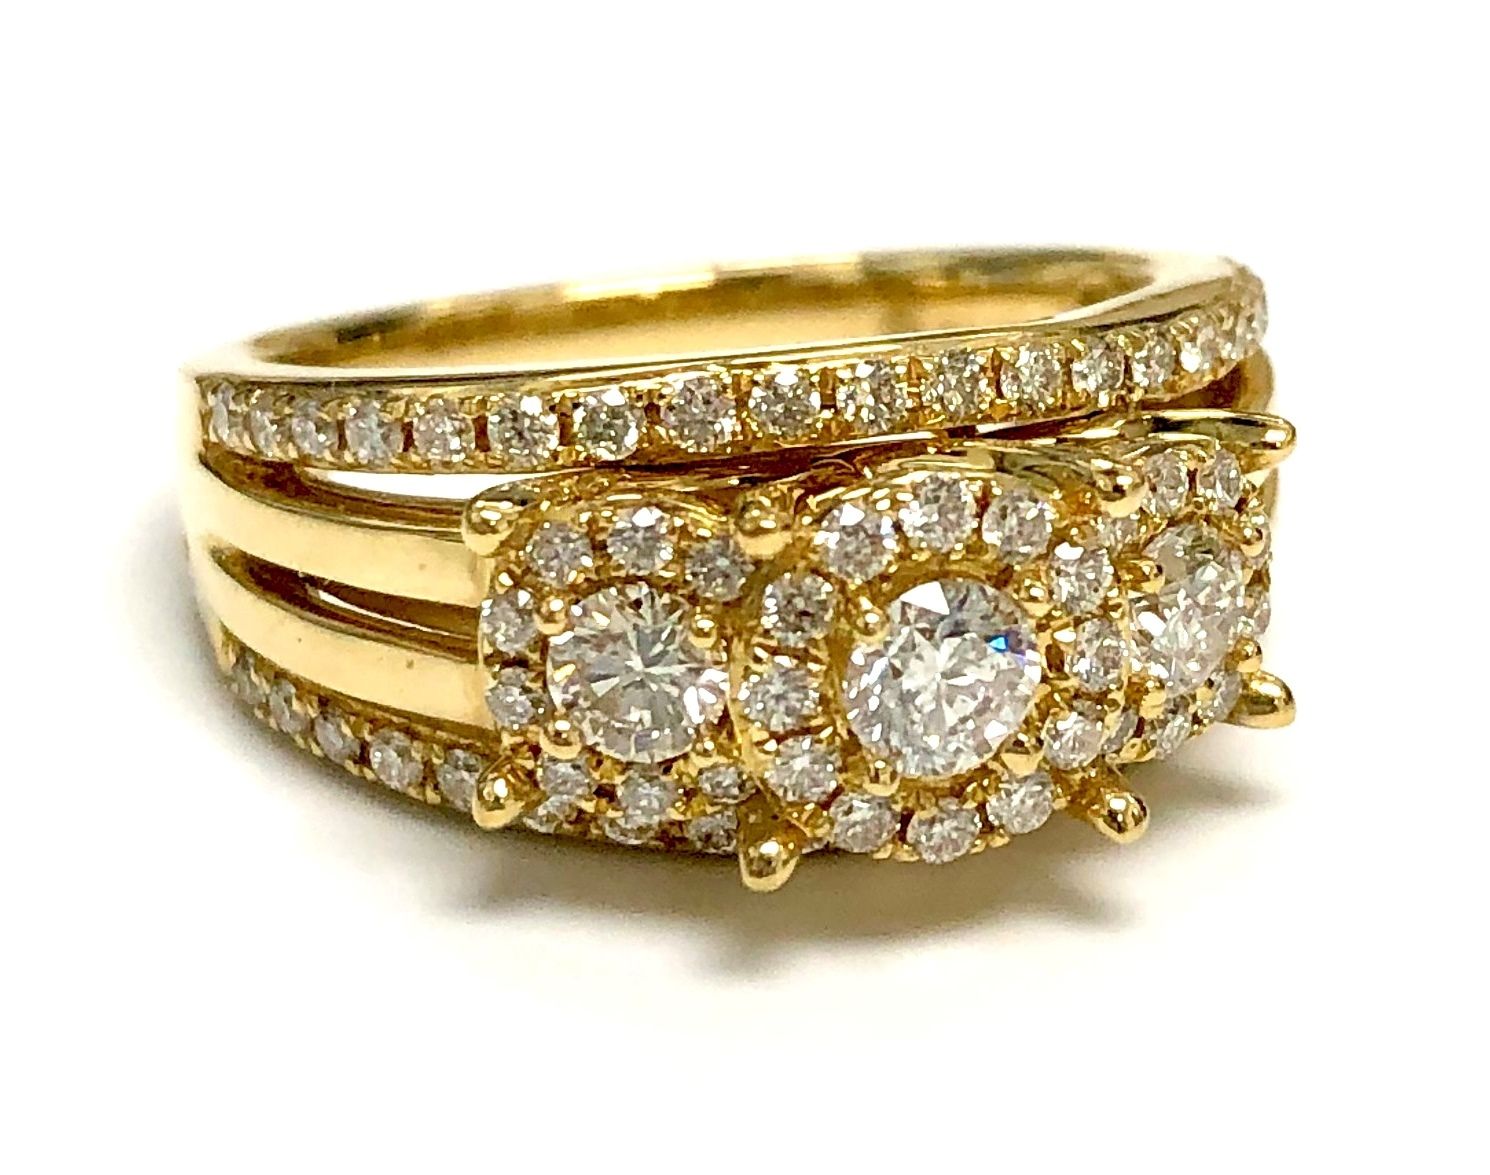 14K Yellow Gold 1.0tcw Diamonds Engagement Ring Size 7 I-12945